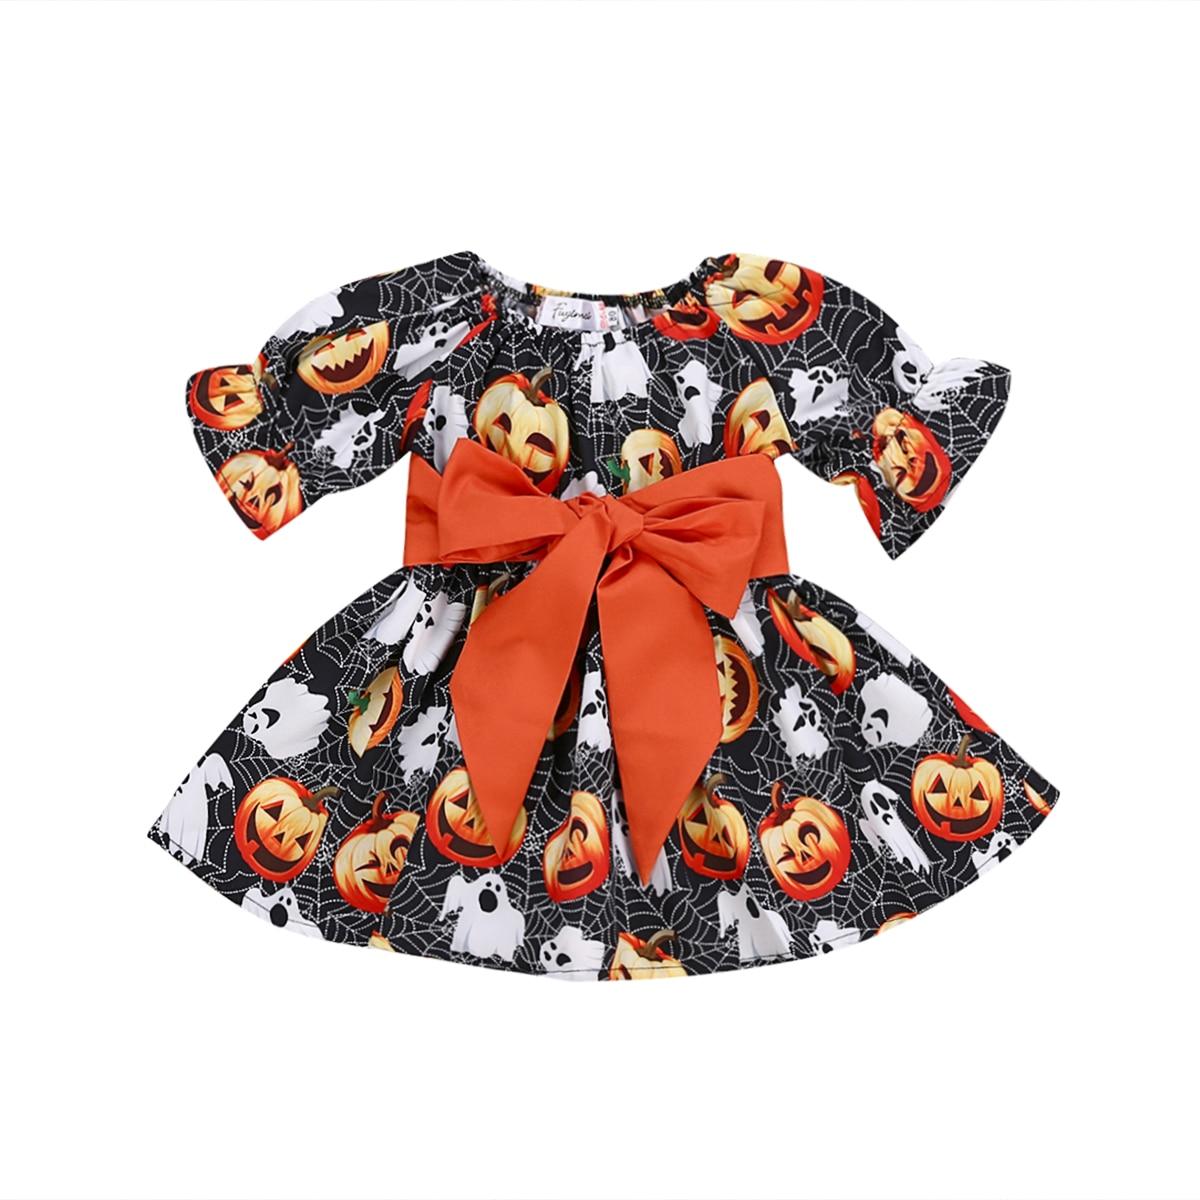 Halloween Newborn Toddler Baby Girl Boy Costume Kid Long Sleeve Bow-knot Pumpkin Printed Tutu  Dress Clothes Outfit